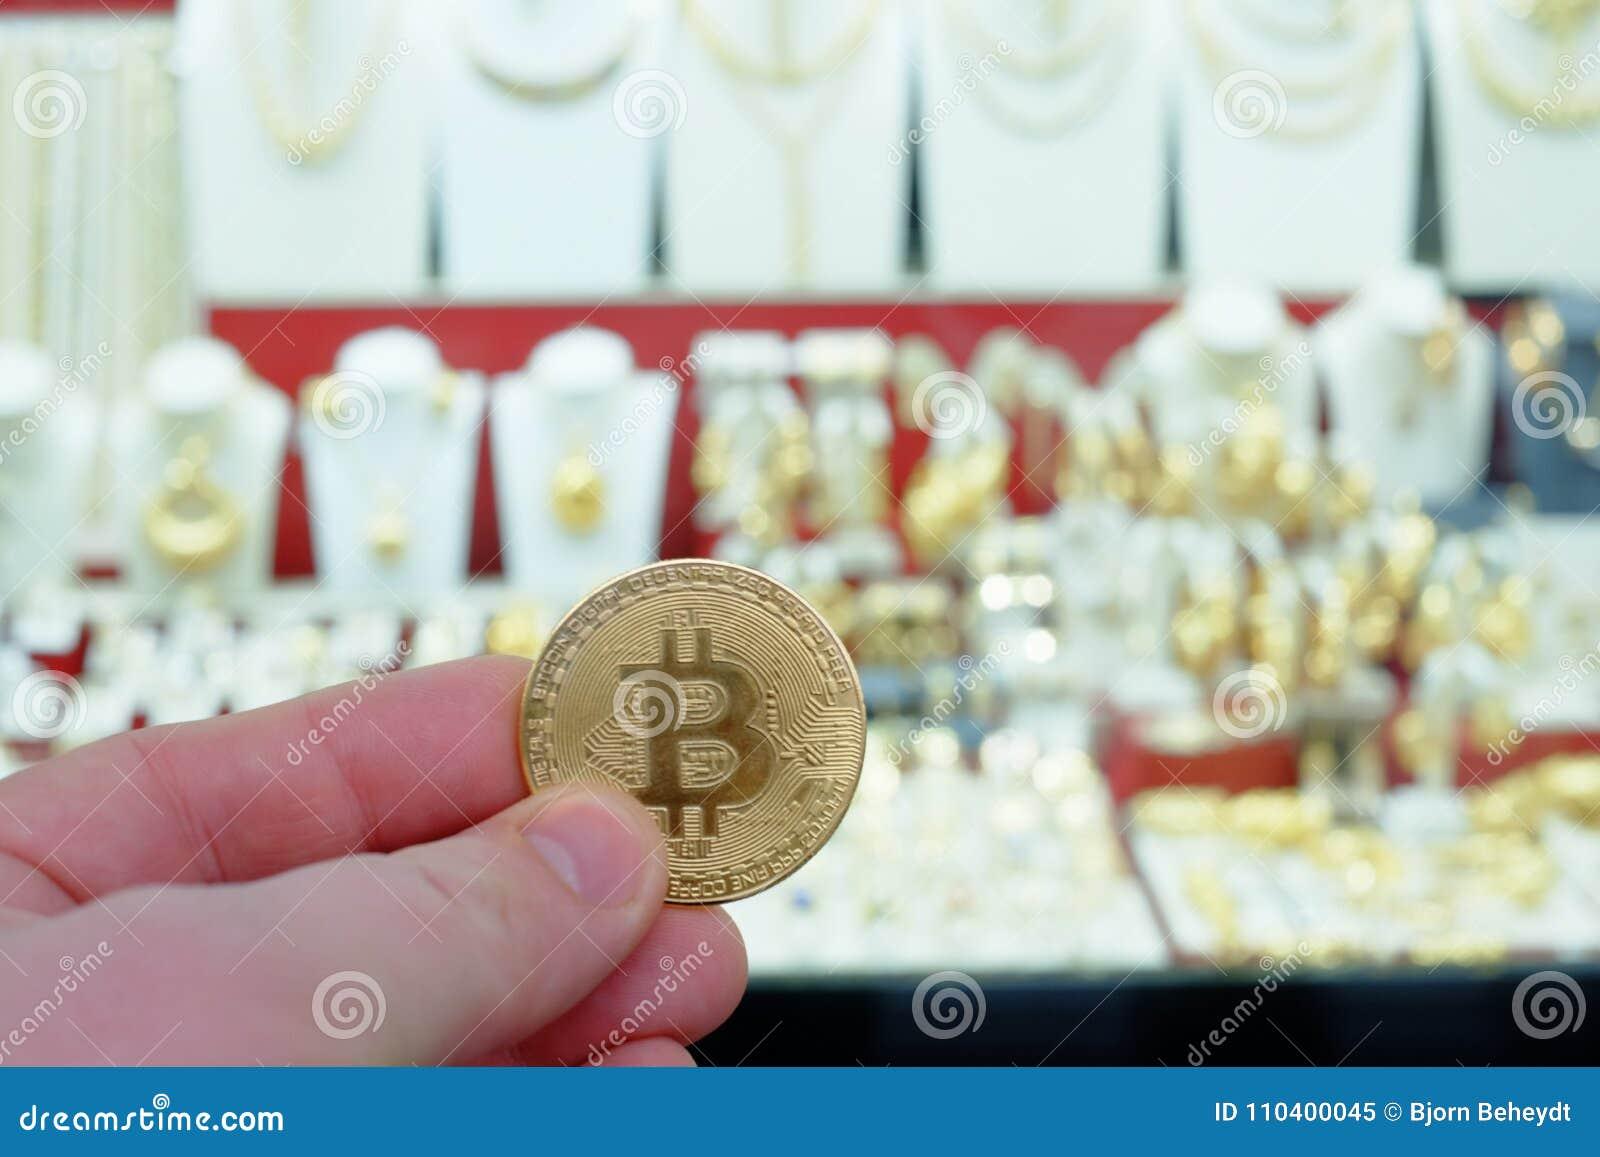 real life bitcoin